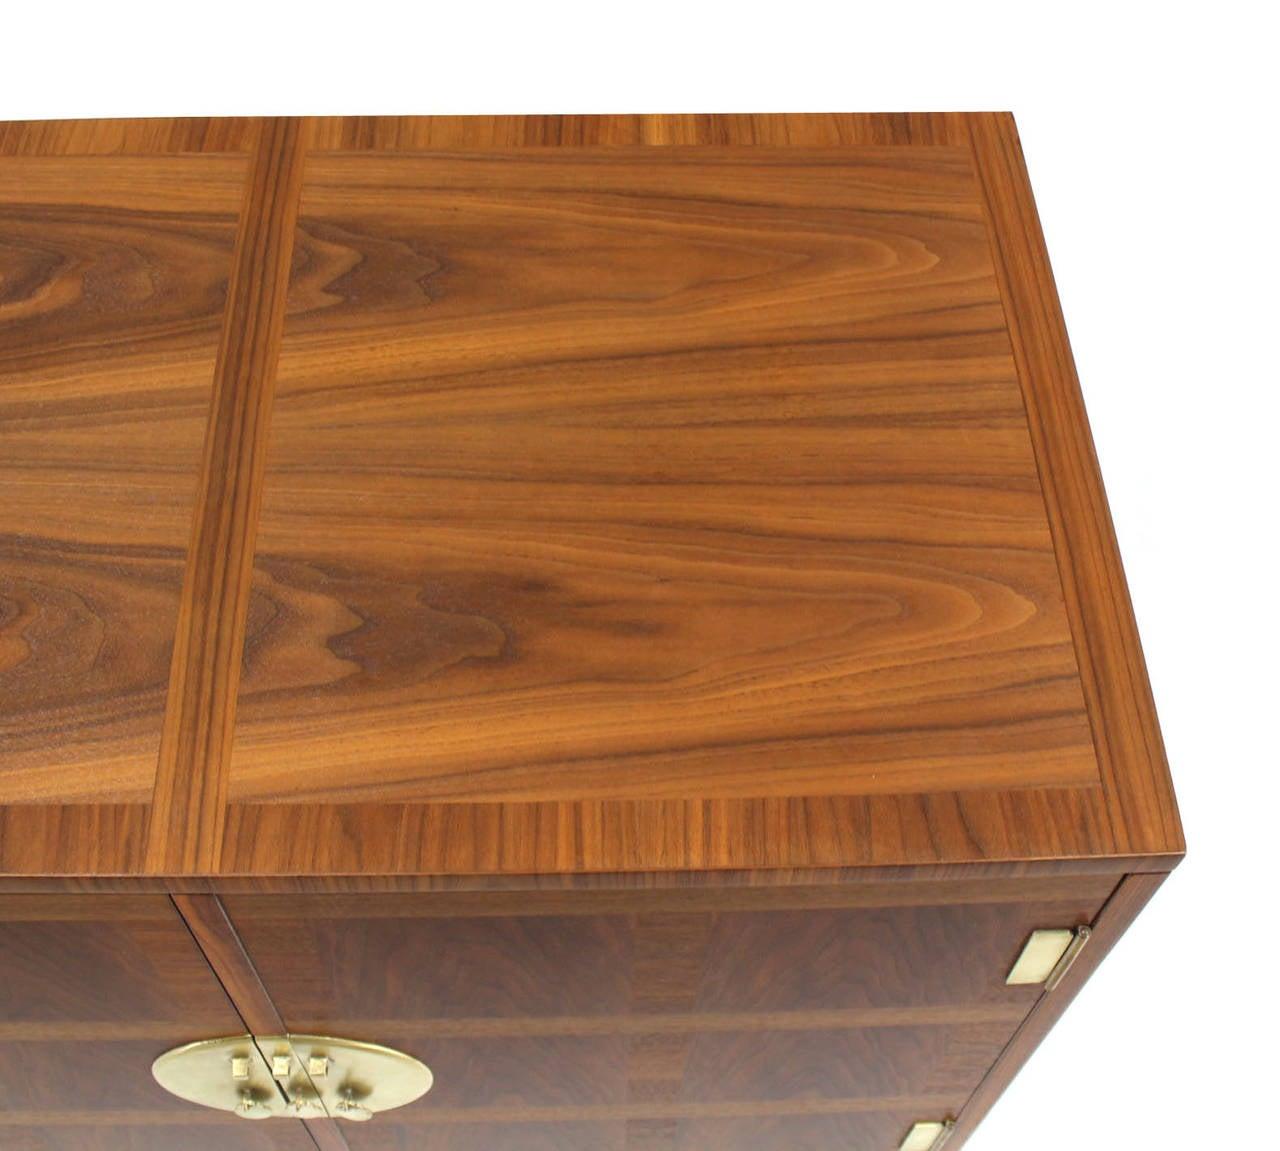 20th Century Baker Mid-Century Modern Long Walnut Dresser Brass Hardware Pulls For Sale